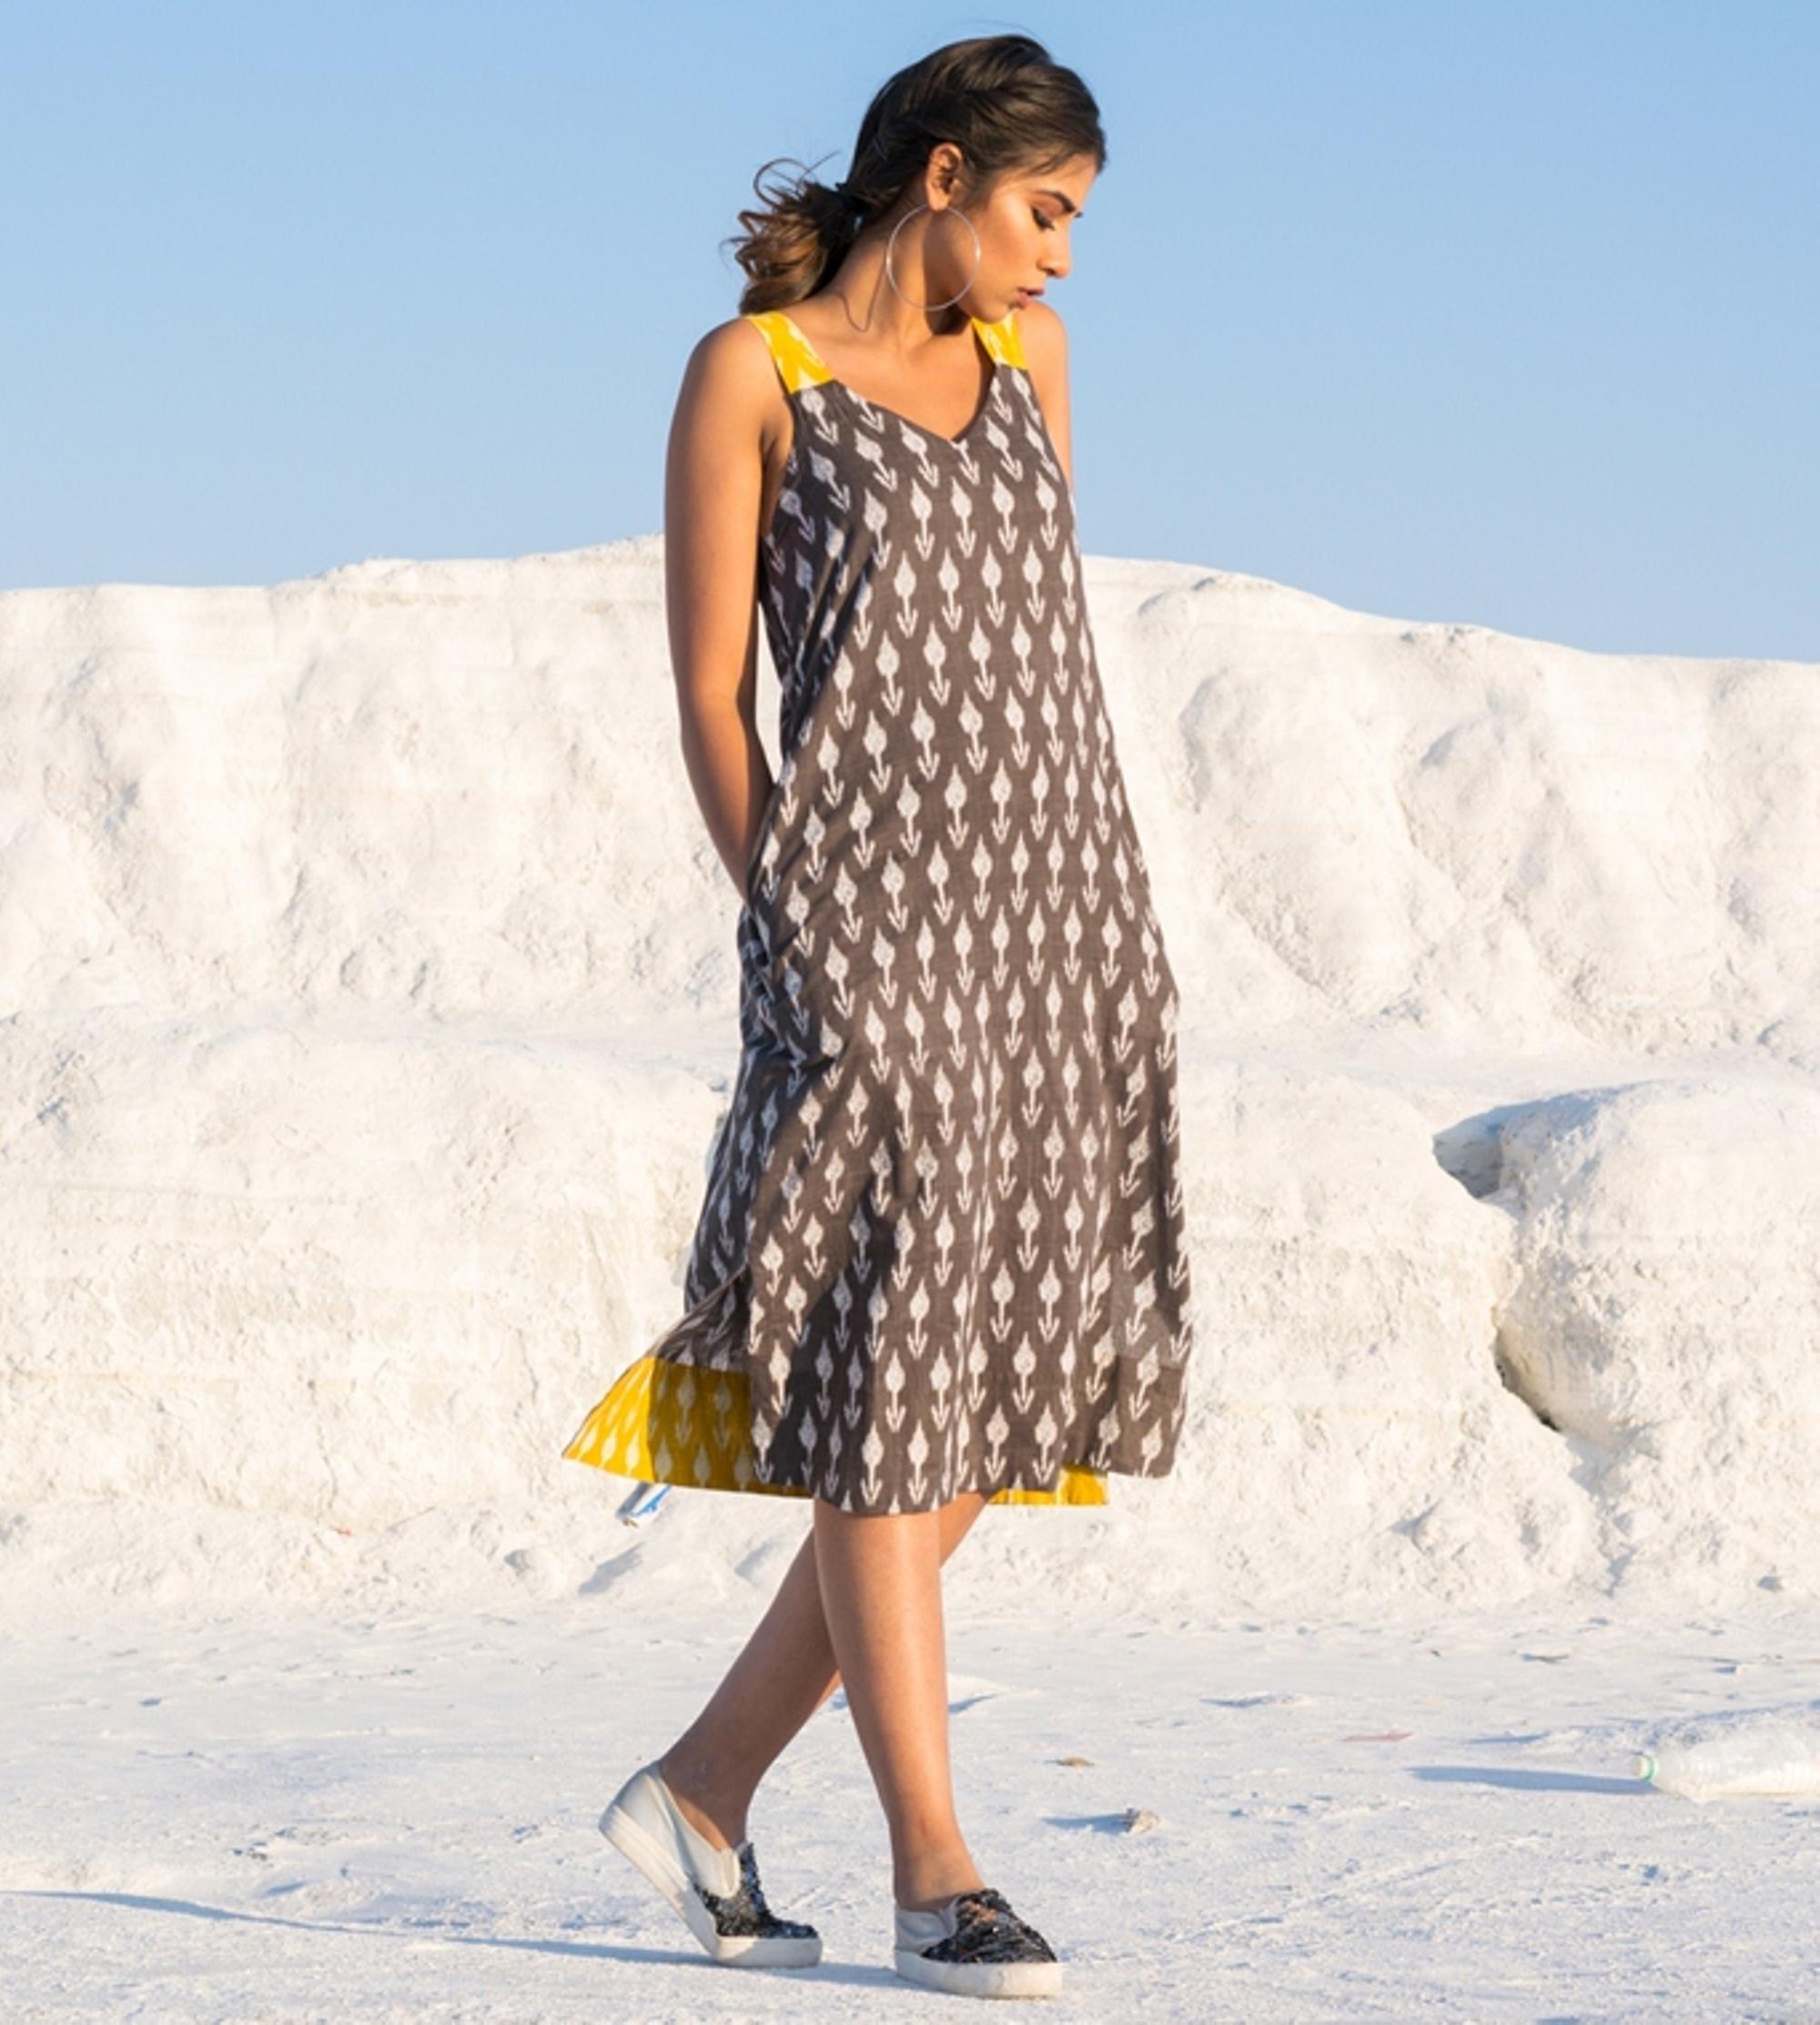 Grey and yellow ikat slit dress